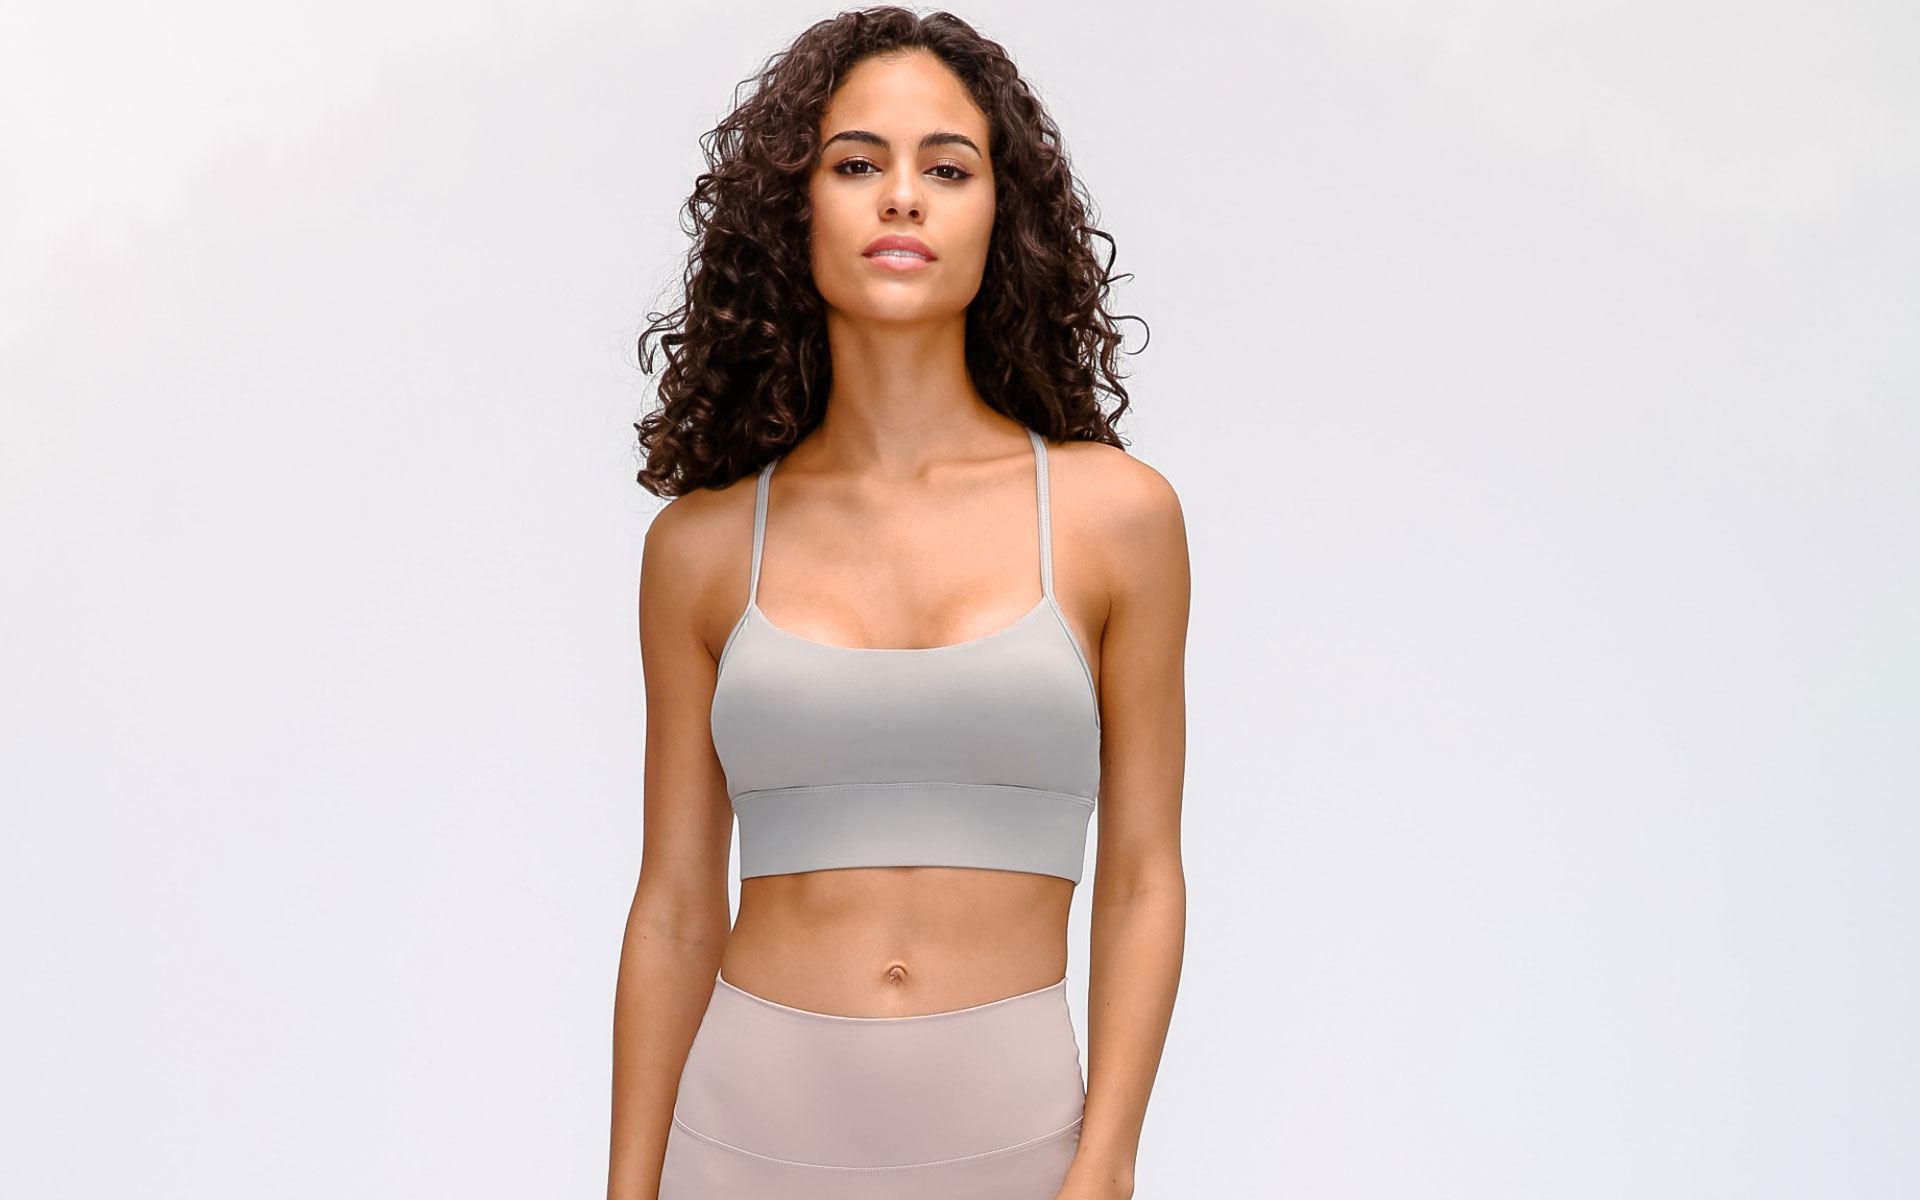 Women's fitness sports bra gray